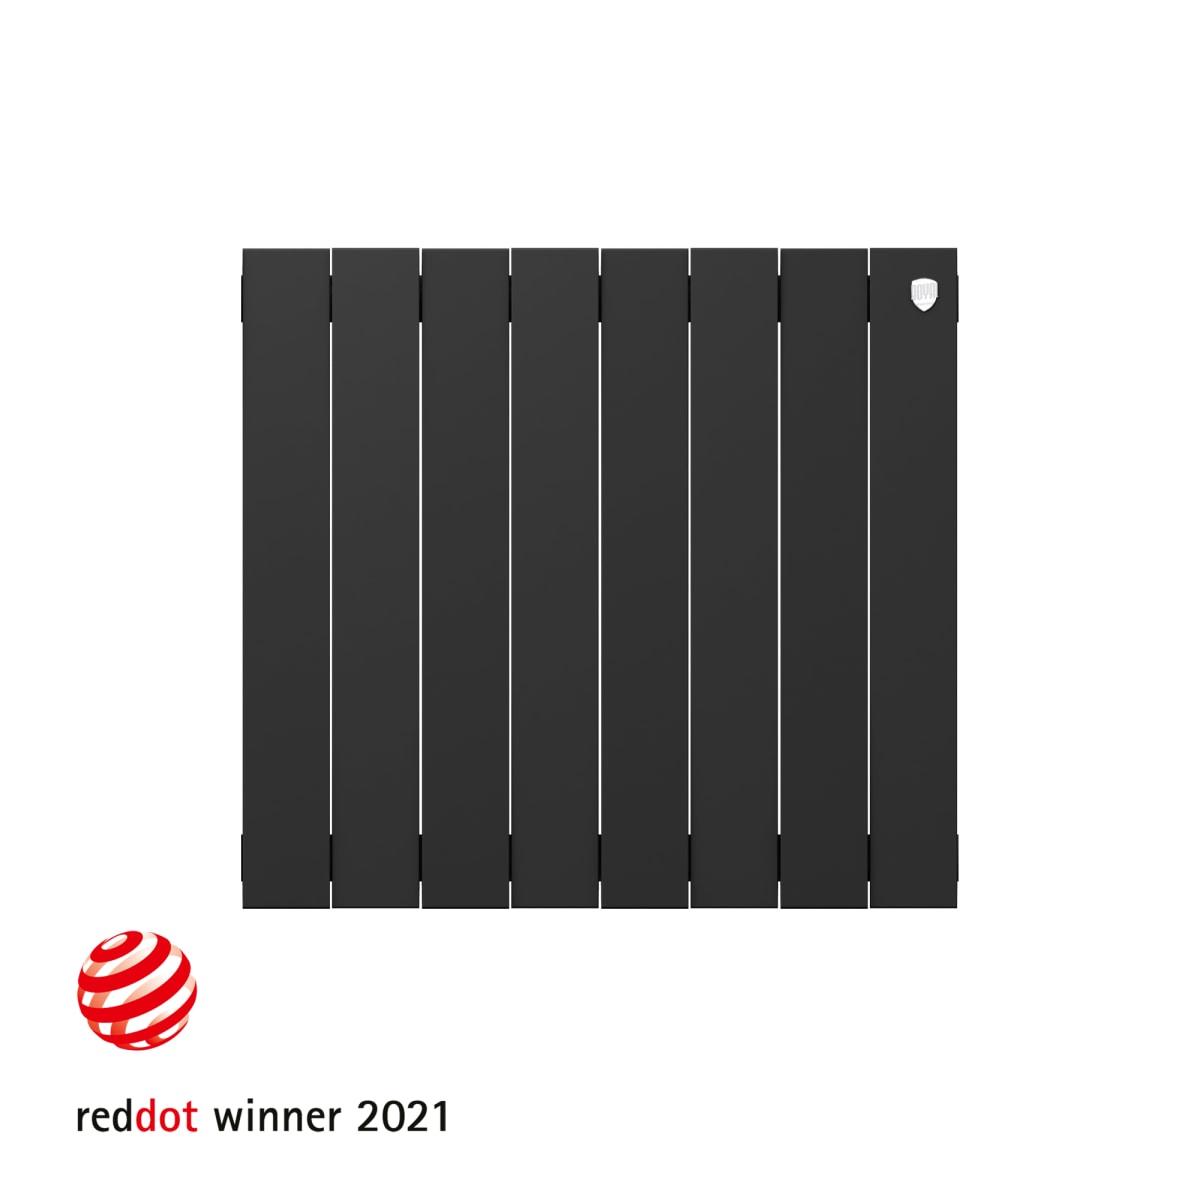 Радиатор Royal Thermo PianoForte 500 8 секций, Noir Sable